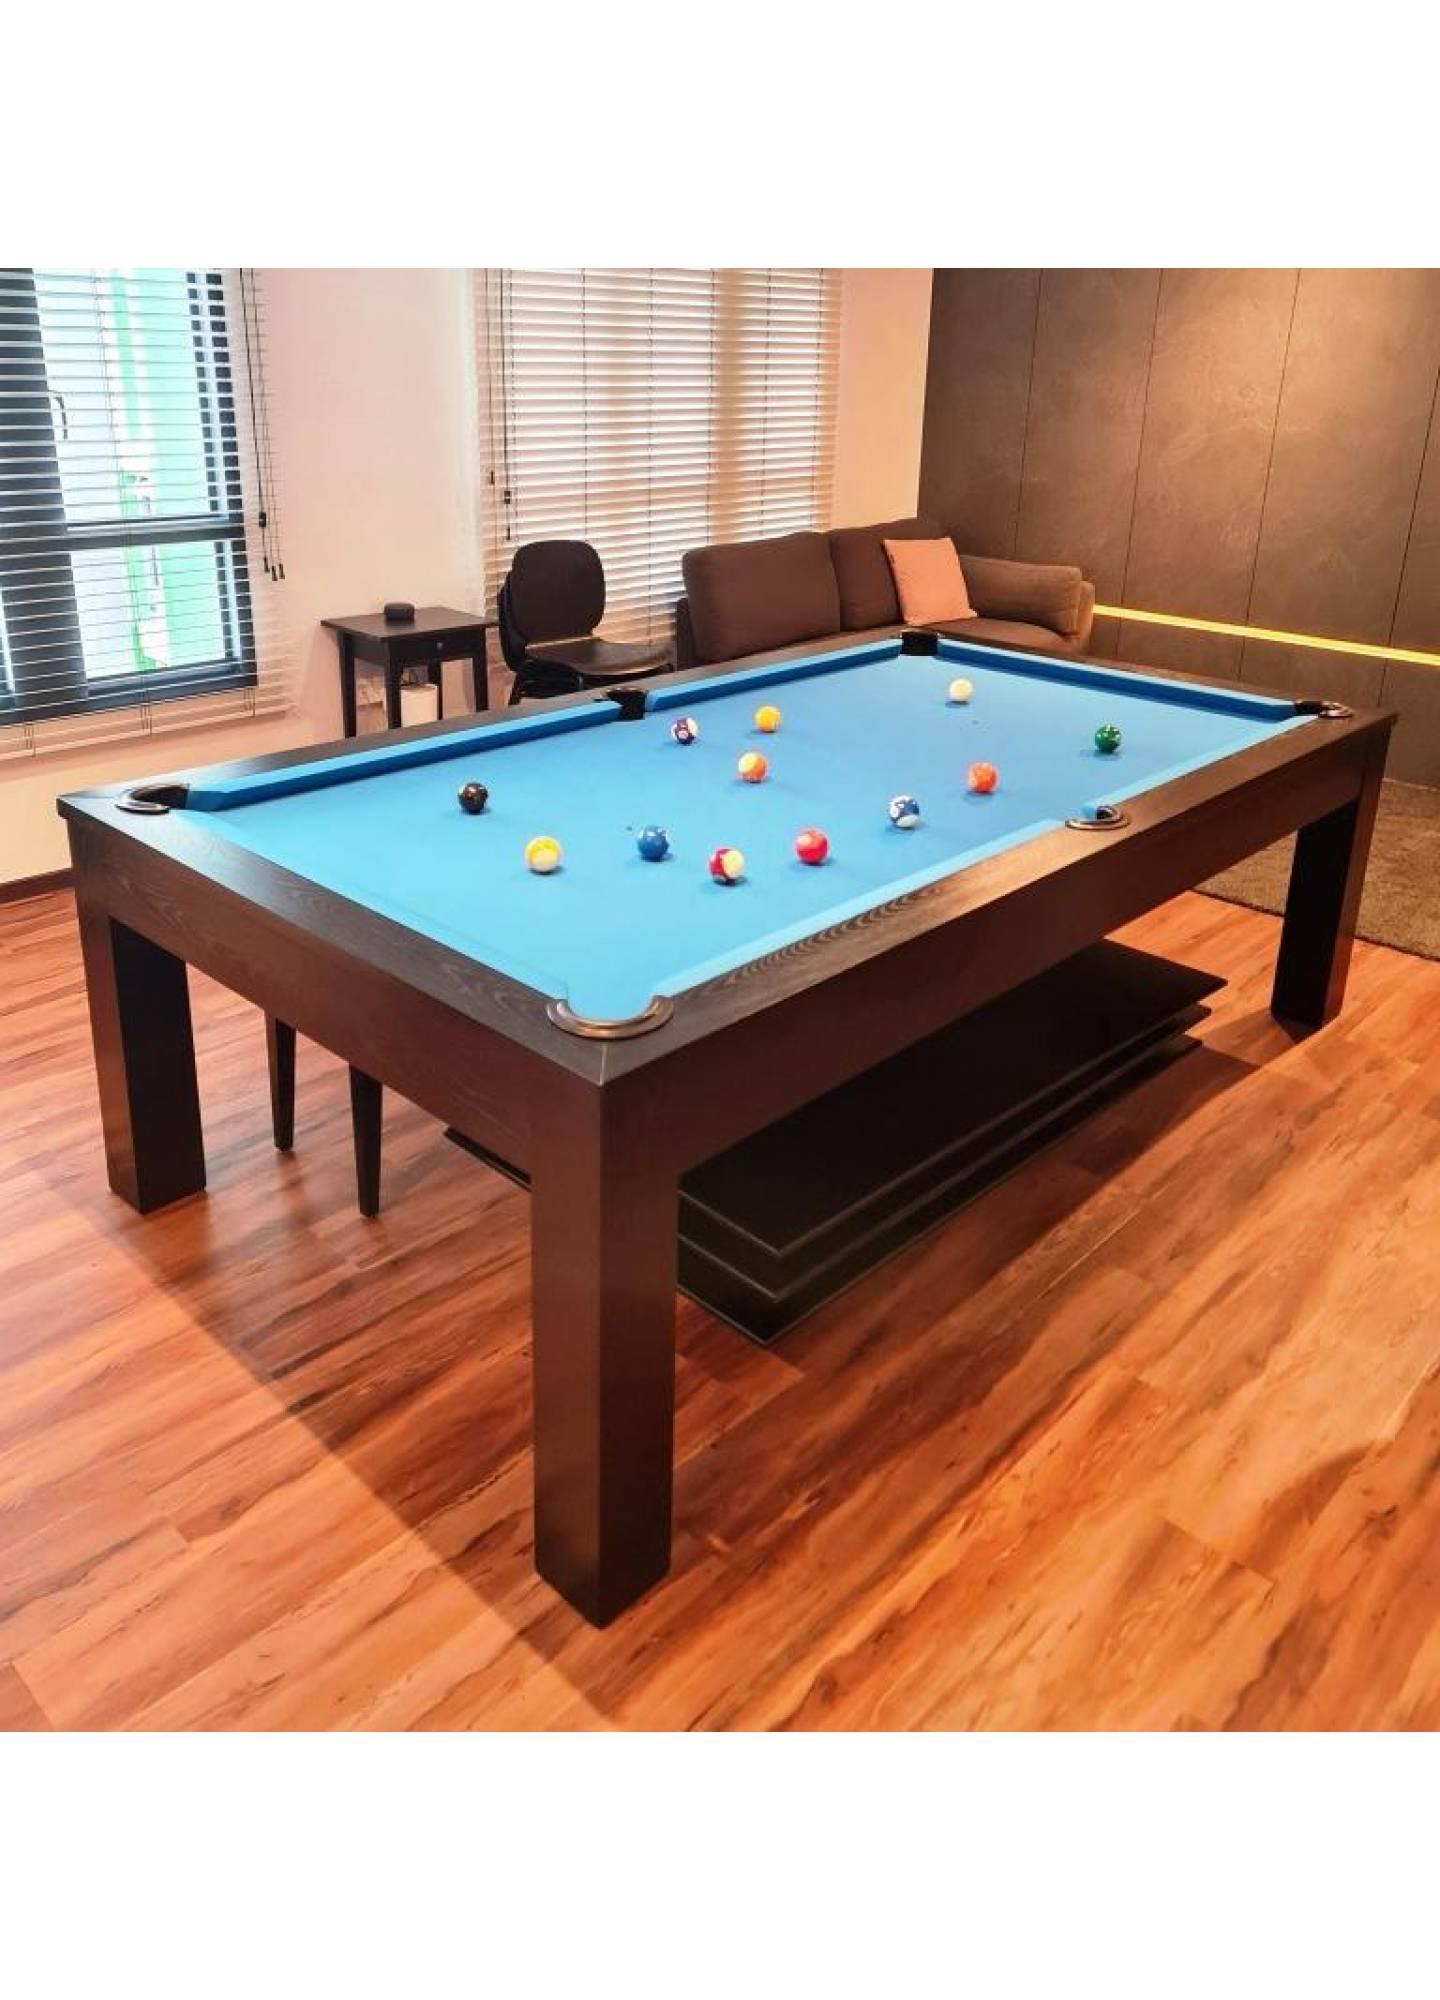 DINER II POOL TABLE